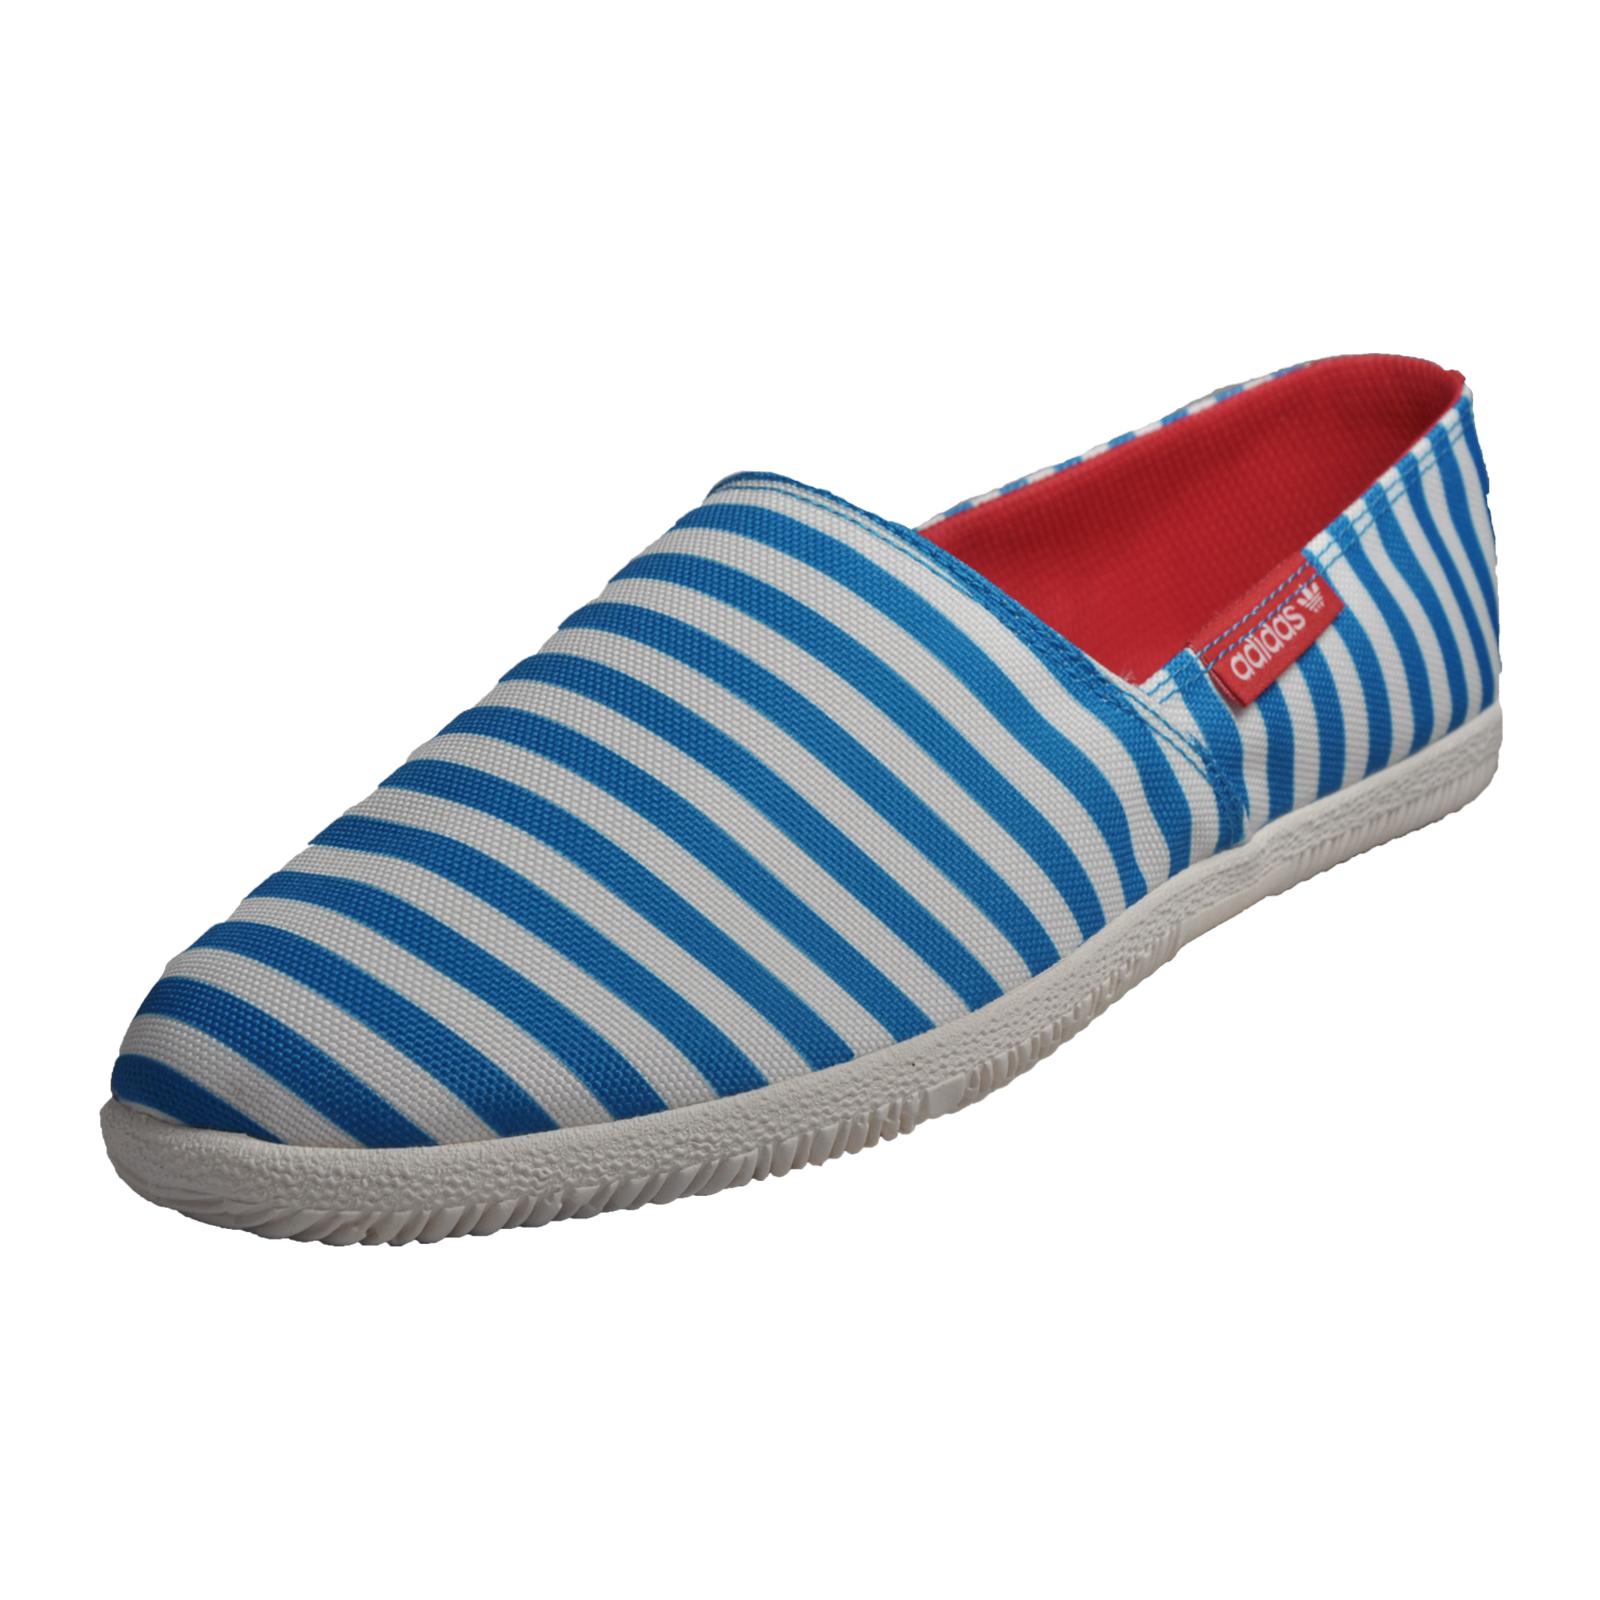 565f64bd1559 Details about Adidas Orignals Adidrill Mens Classic Summer Slip On  Espadrilles White Blue B Gr